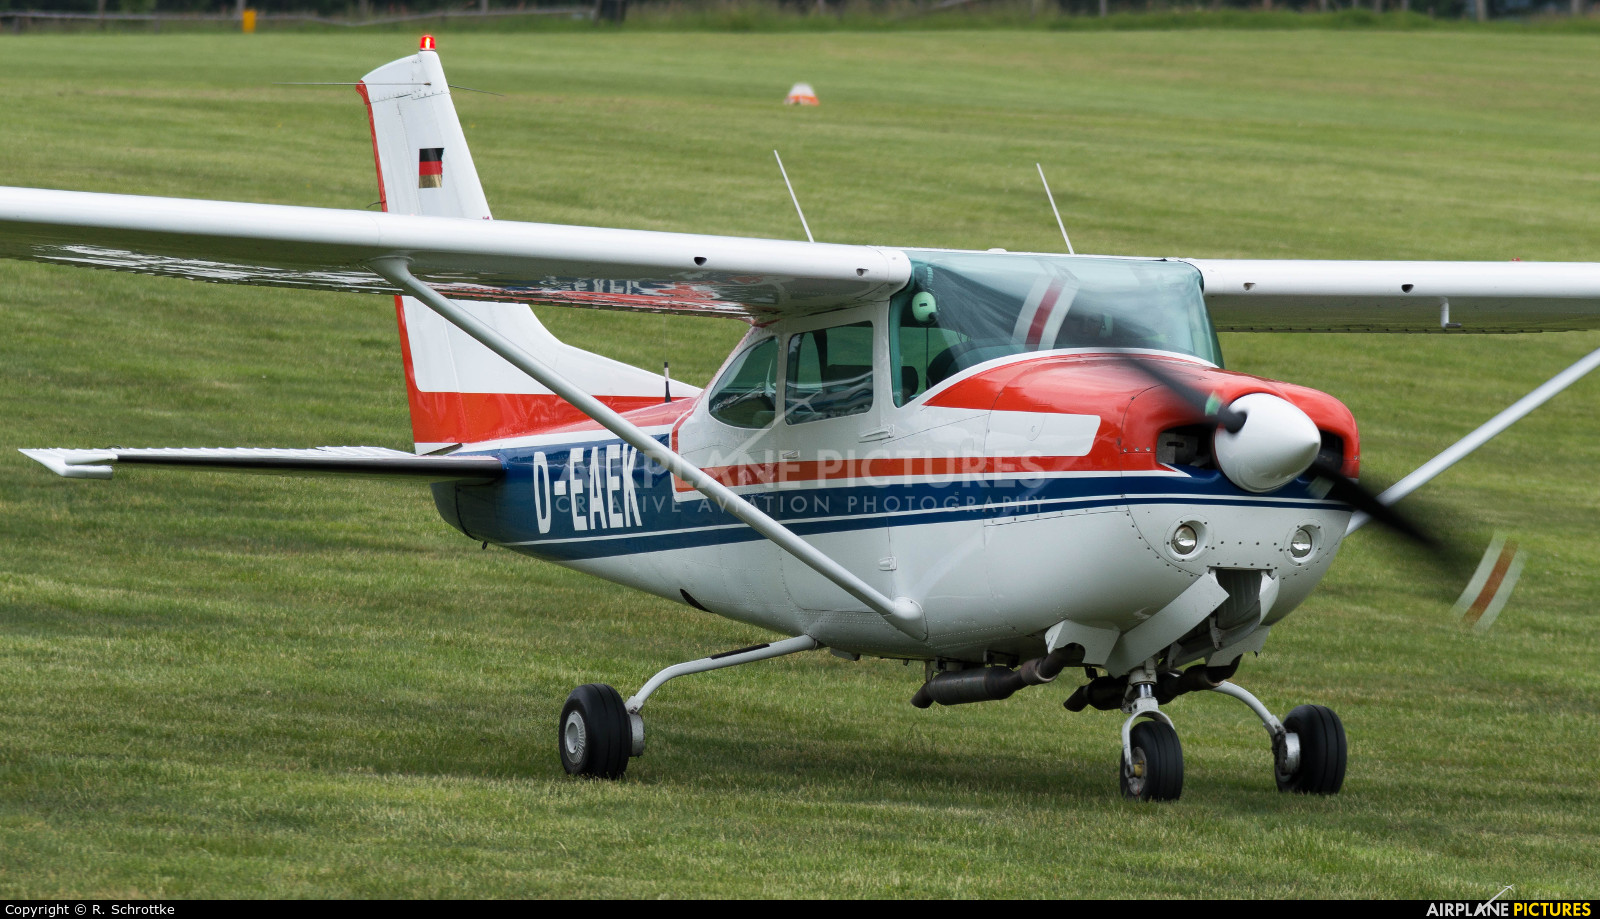 Private D-EAEK aircraft at Bergneustadt auf dem Duempel